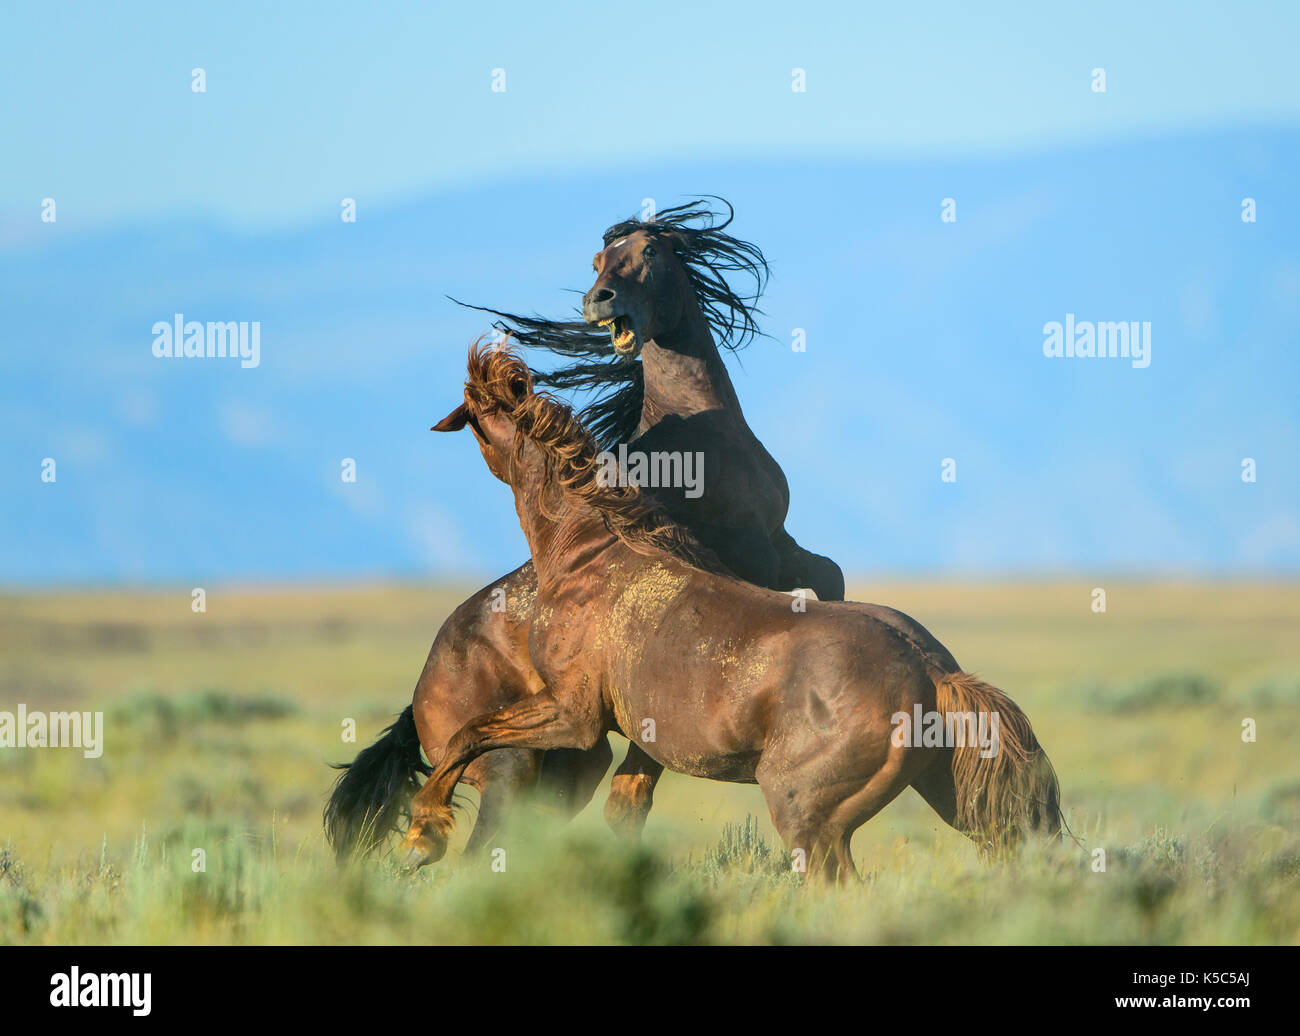 Wild Horse Stallions Fighting (Equus ferus), Western US - Stock Image